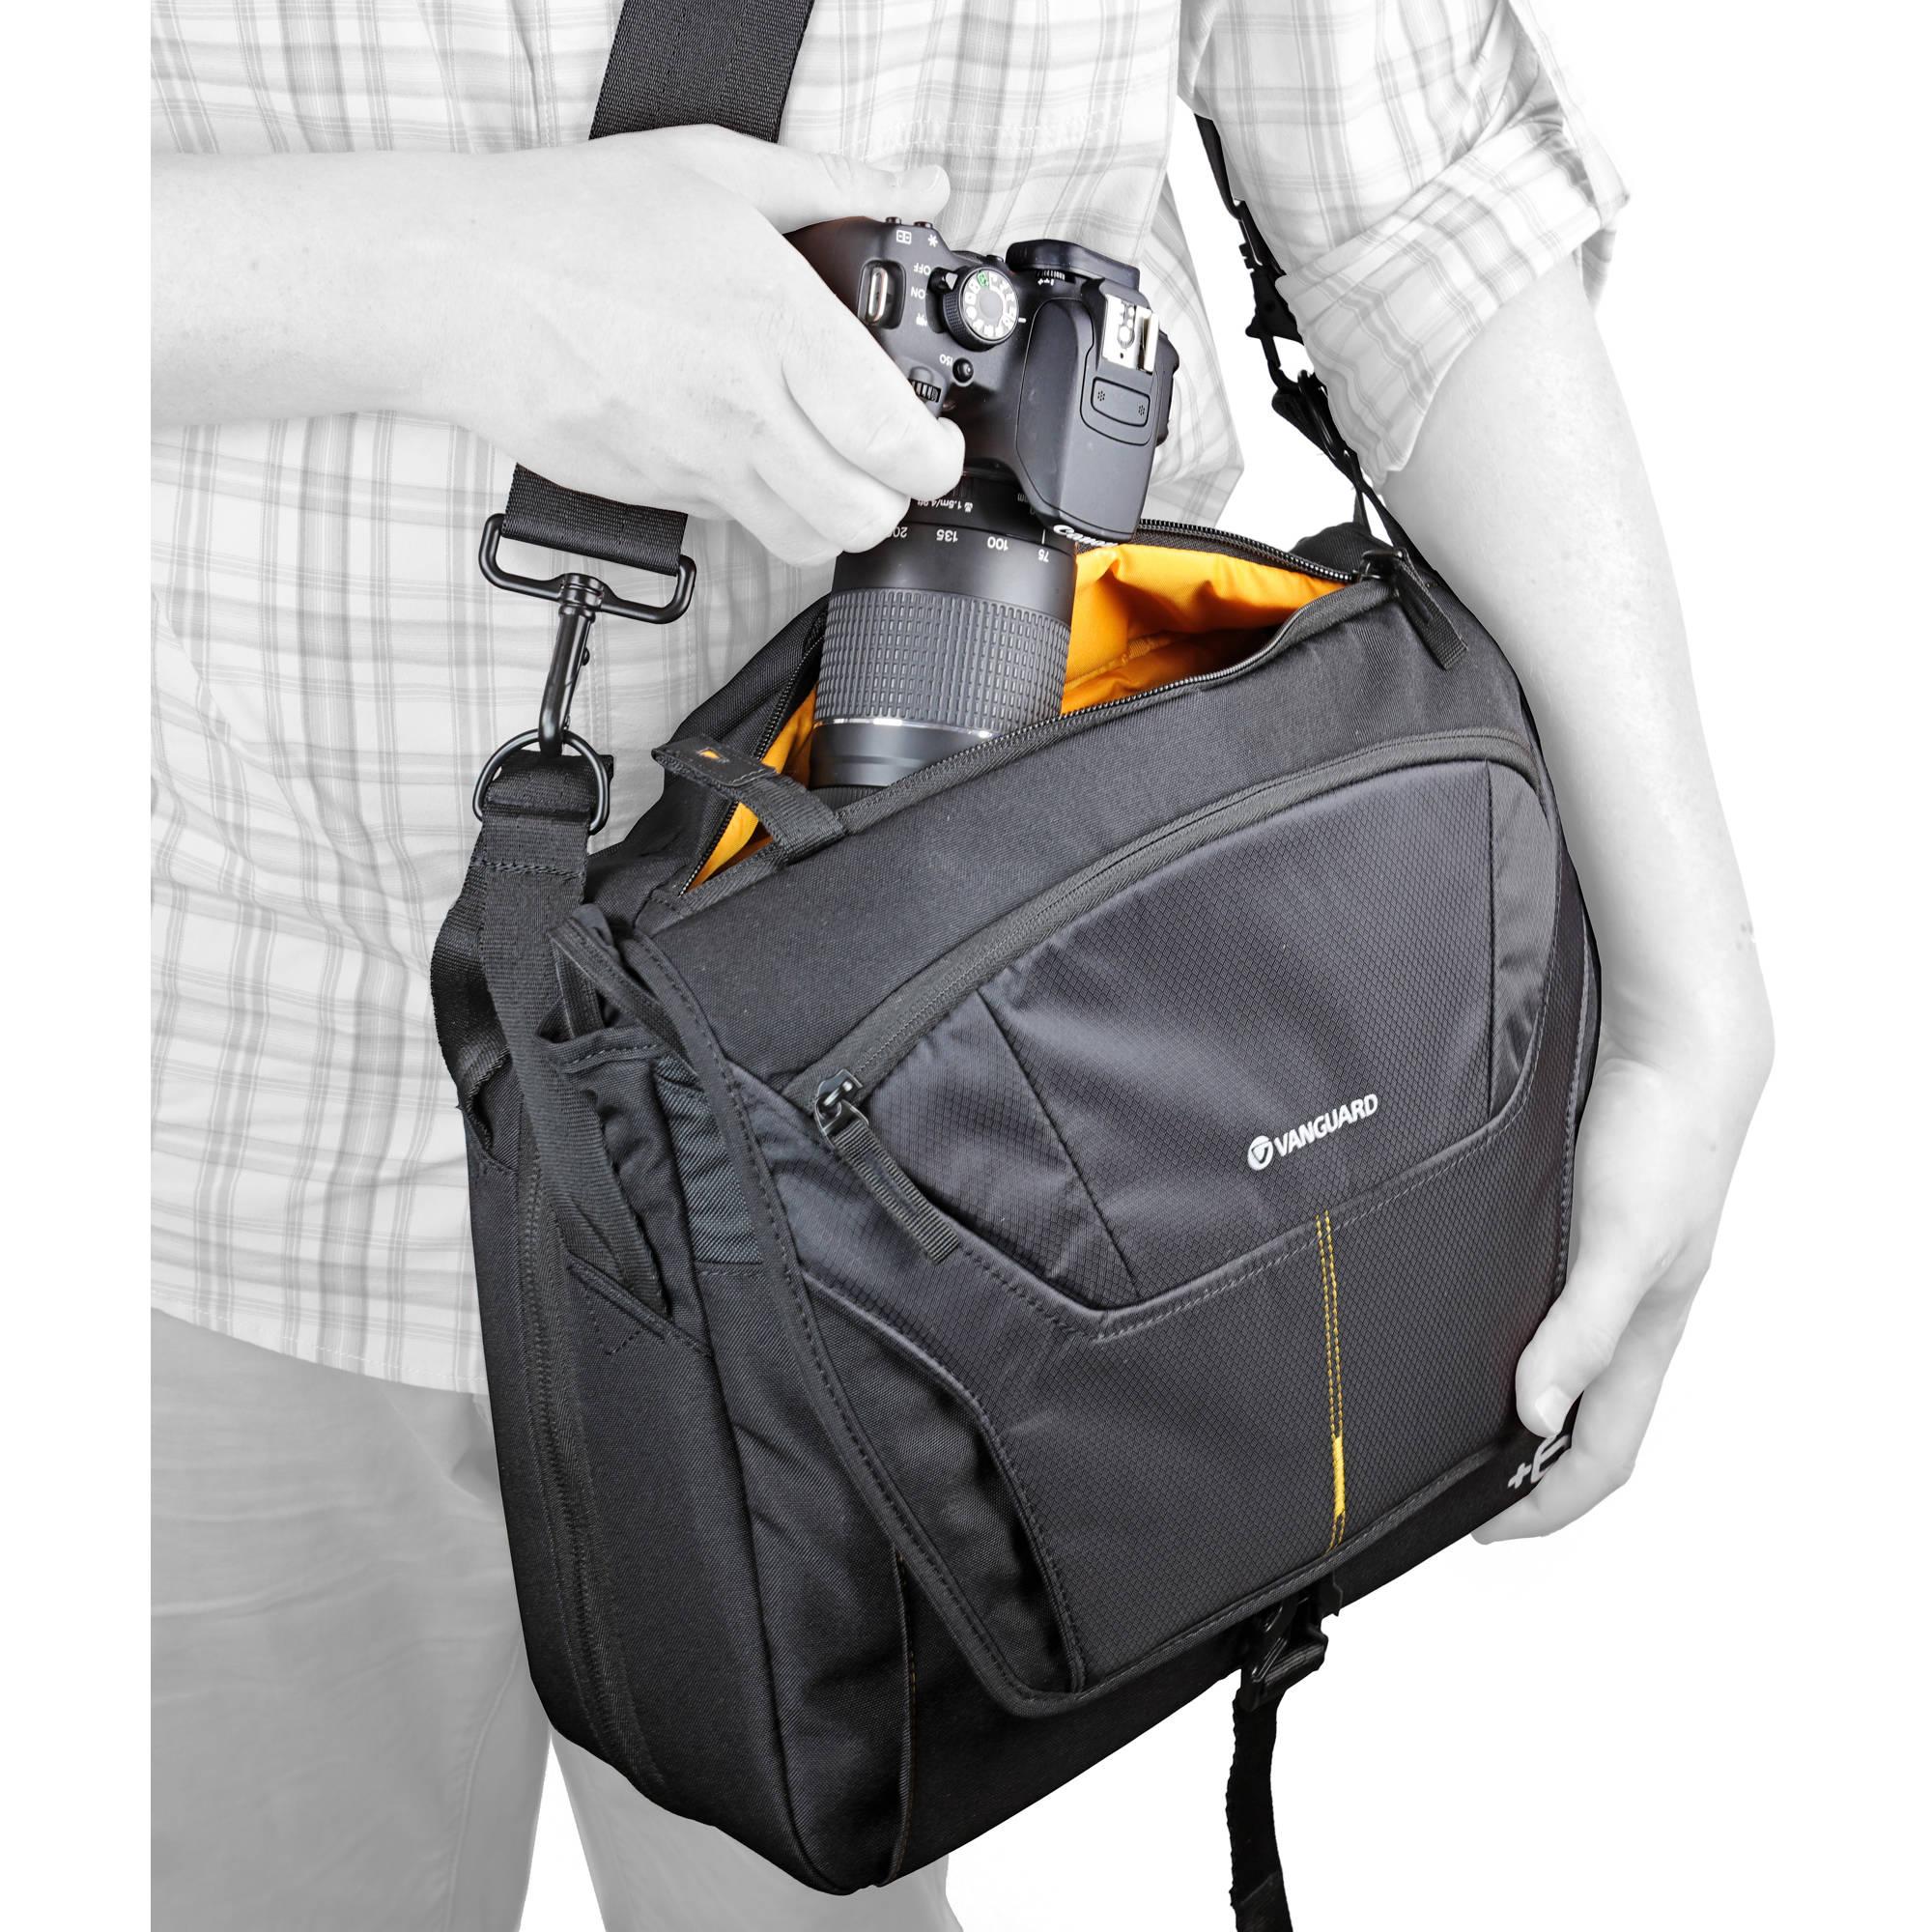 Small Vanguard Alta Rise 28 Expanding Messenger Bag for Camera